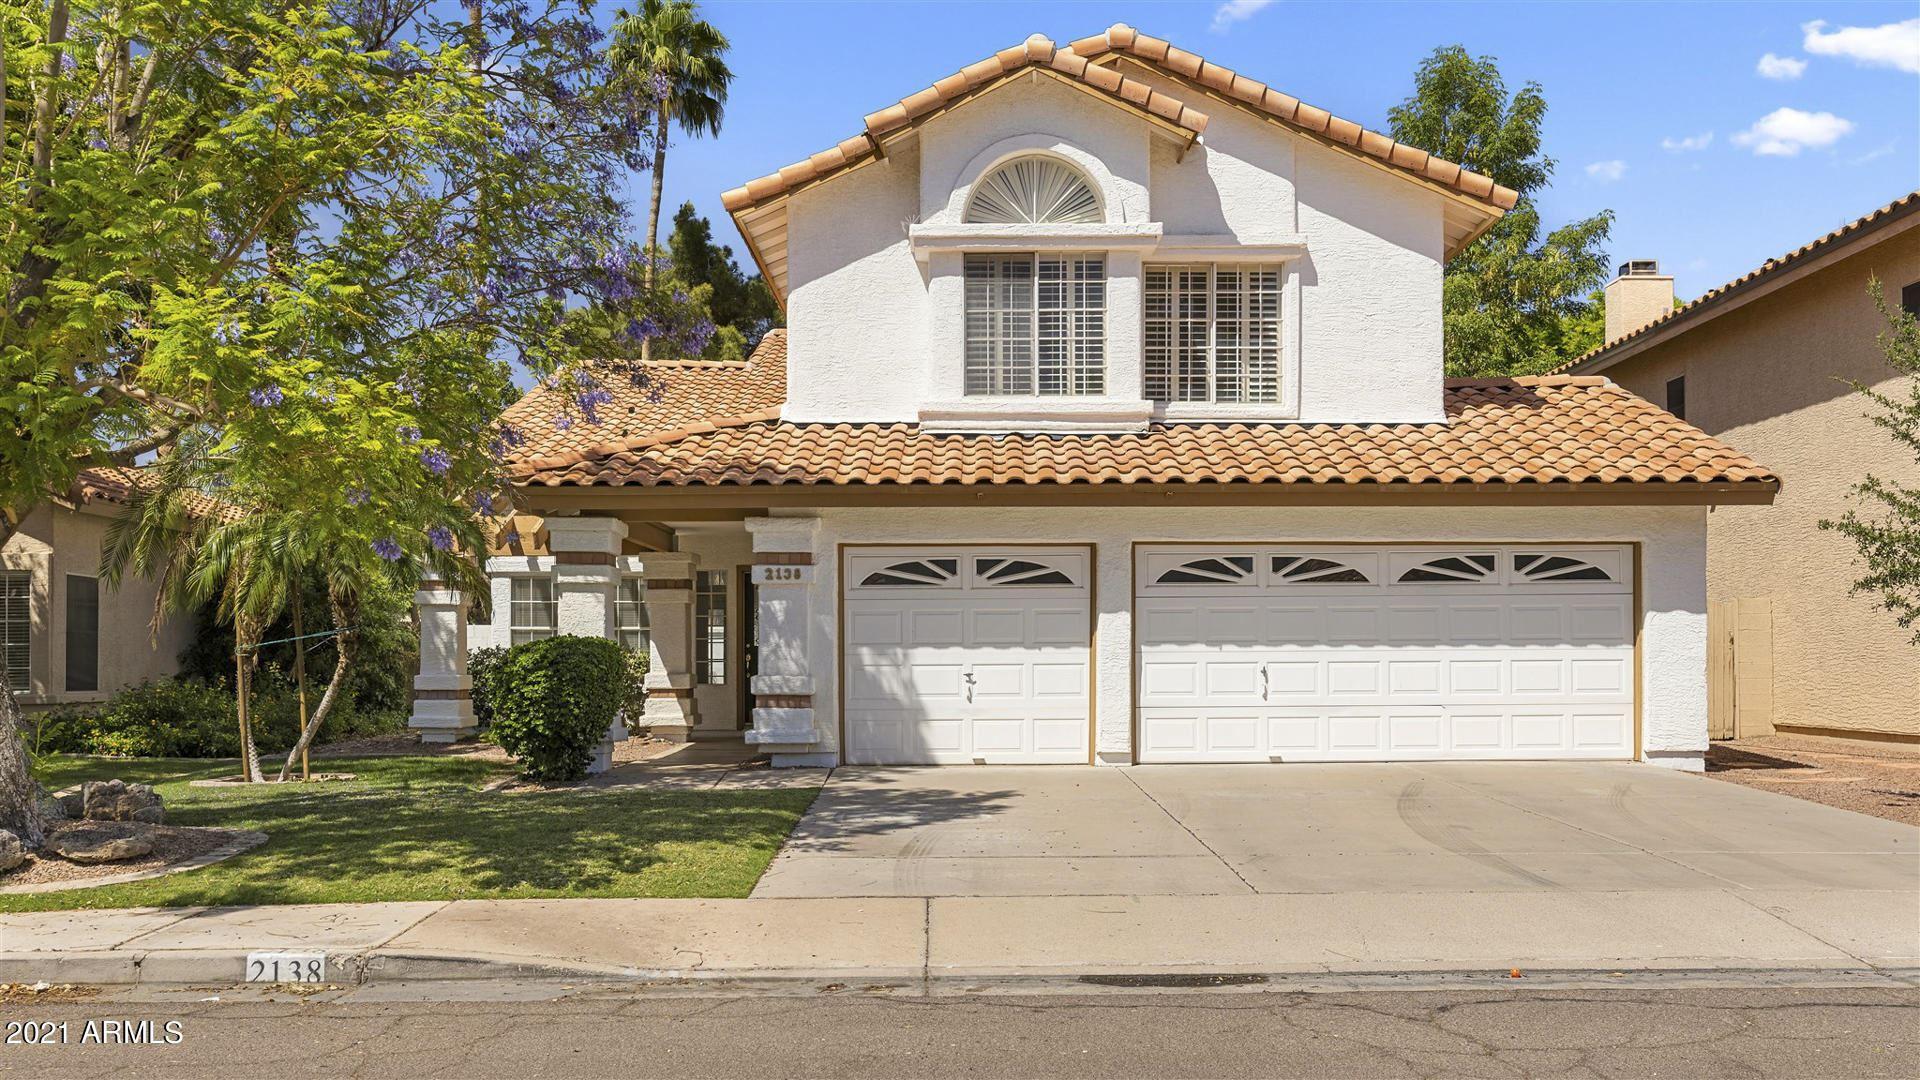 Photo of 2138 E CHESAPEAKE Drive, Gilbert, AZ 85234 (MLS # 6231848)